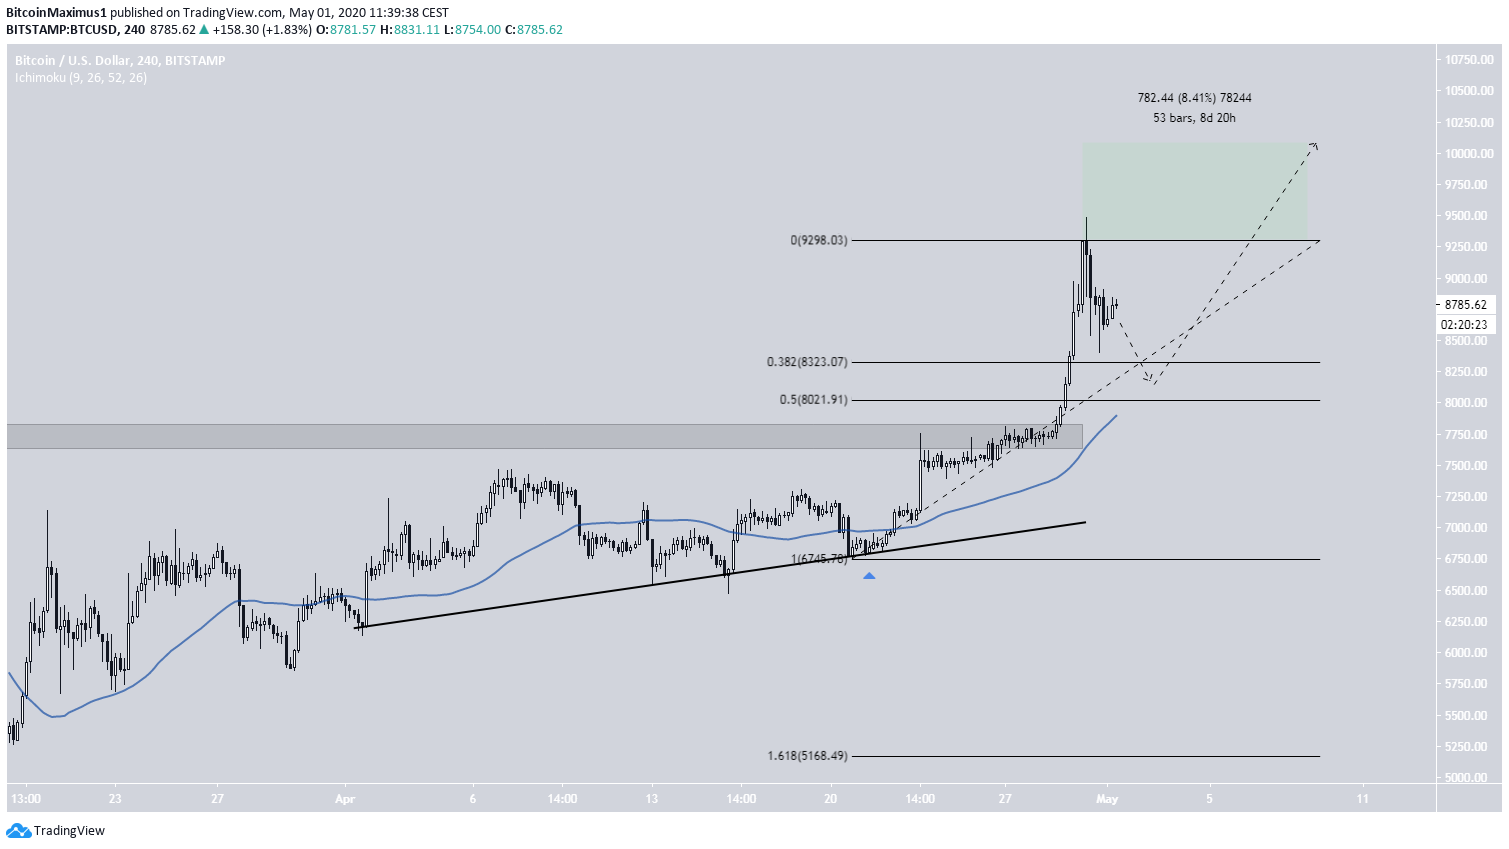 Bitcoin 2020 Price MOvement